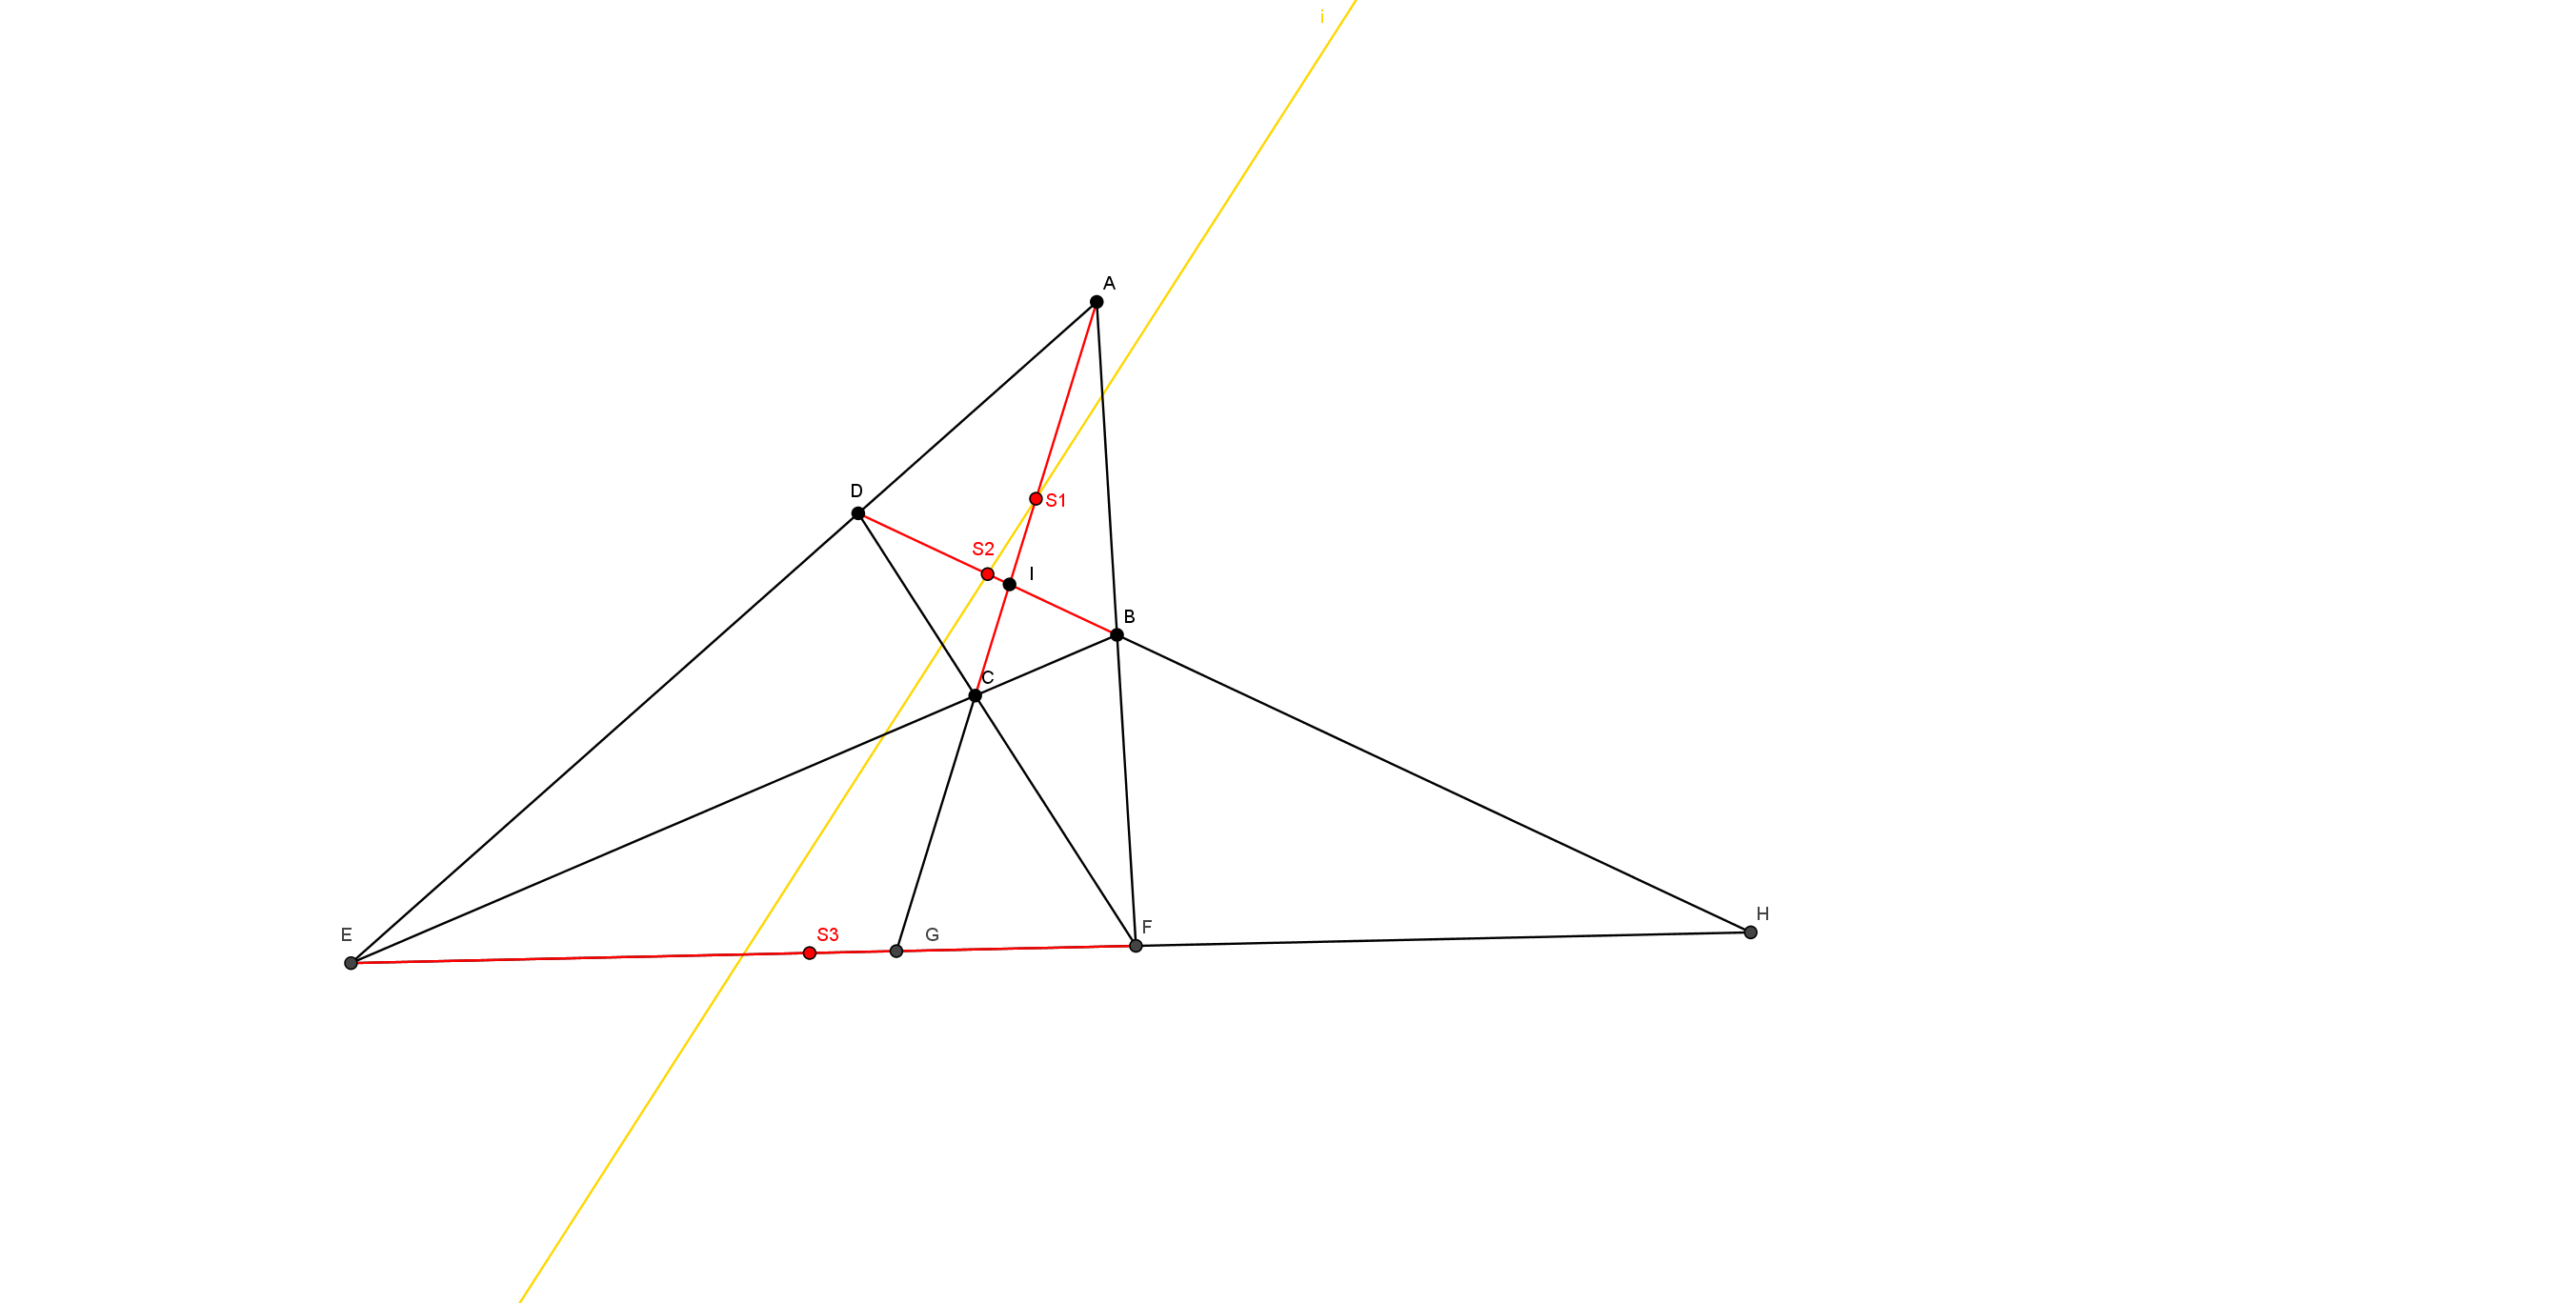 http://forum.matematika.cz/upload3/img/2017-07/80501_Newton%2Bvlastnost%2B%25C4%258Dty%25C5%2599%25C3%25BAhlen%25C3%25ADku.png